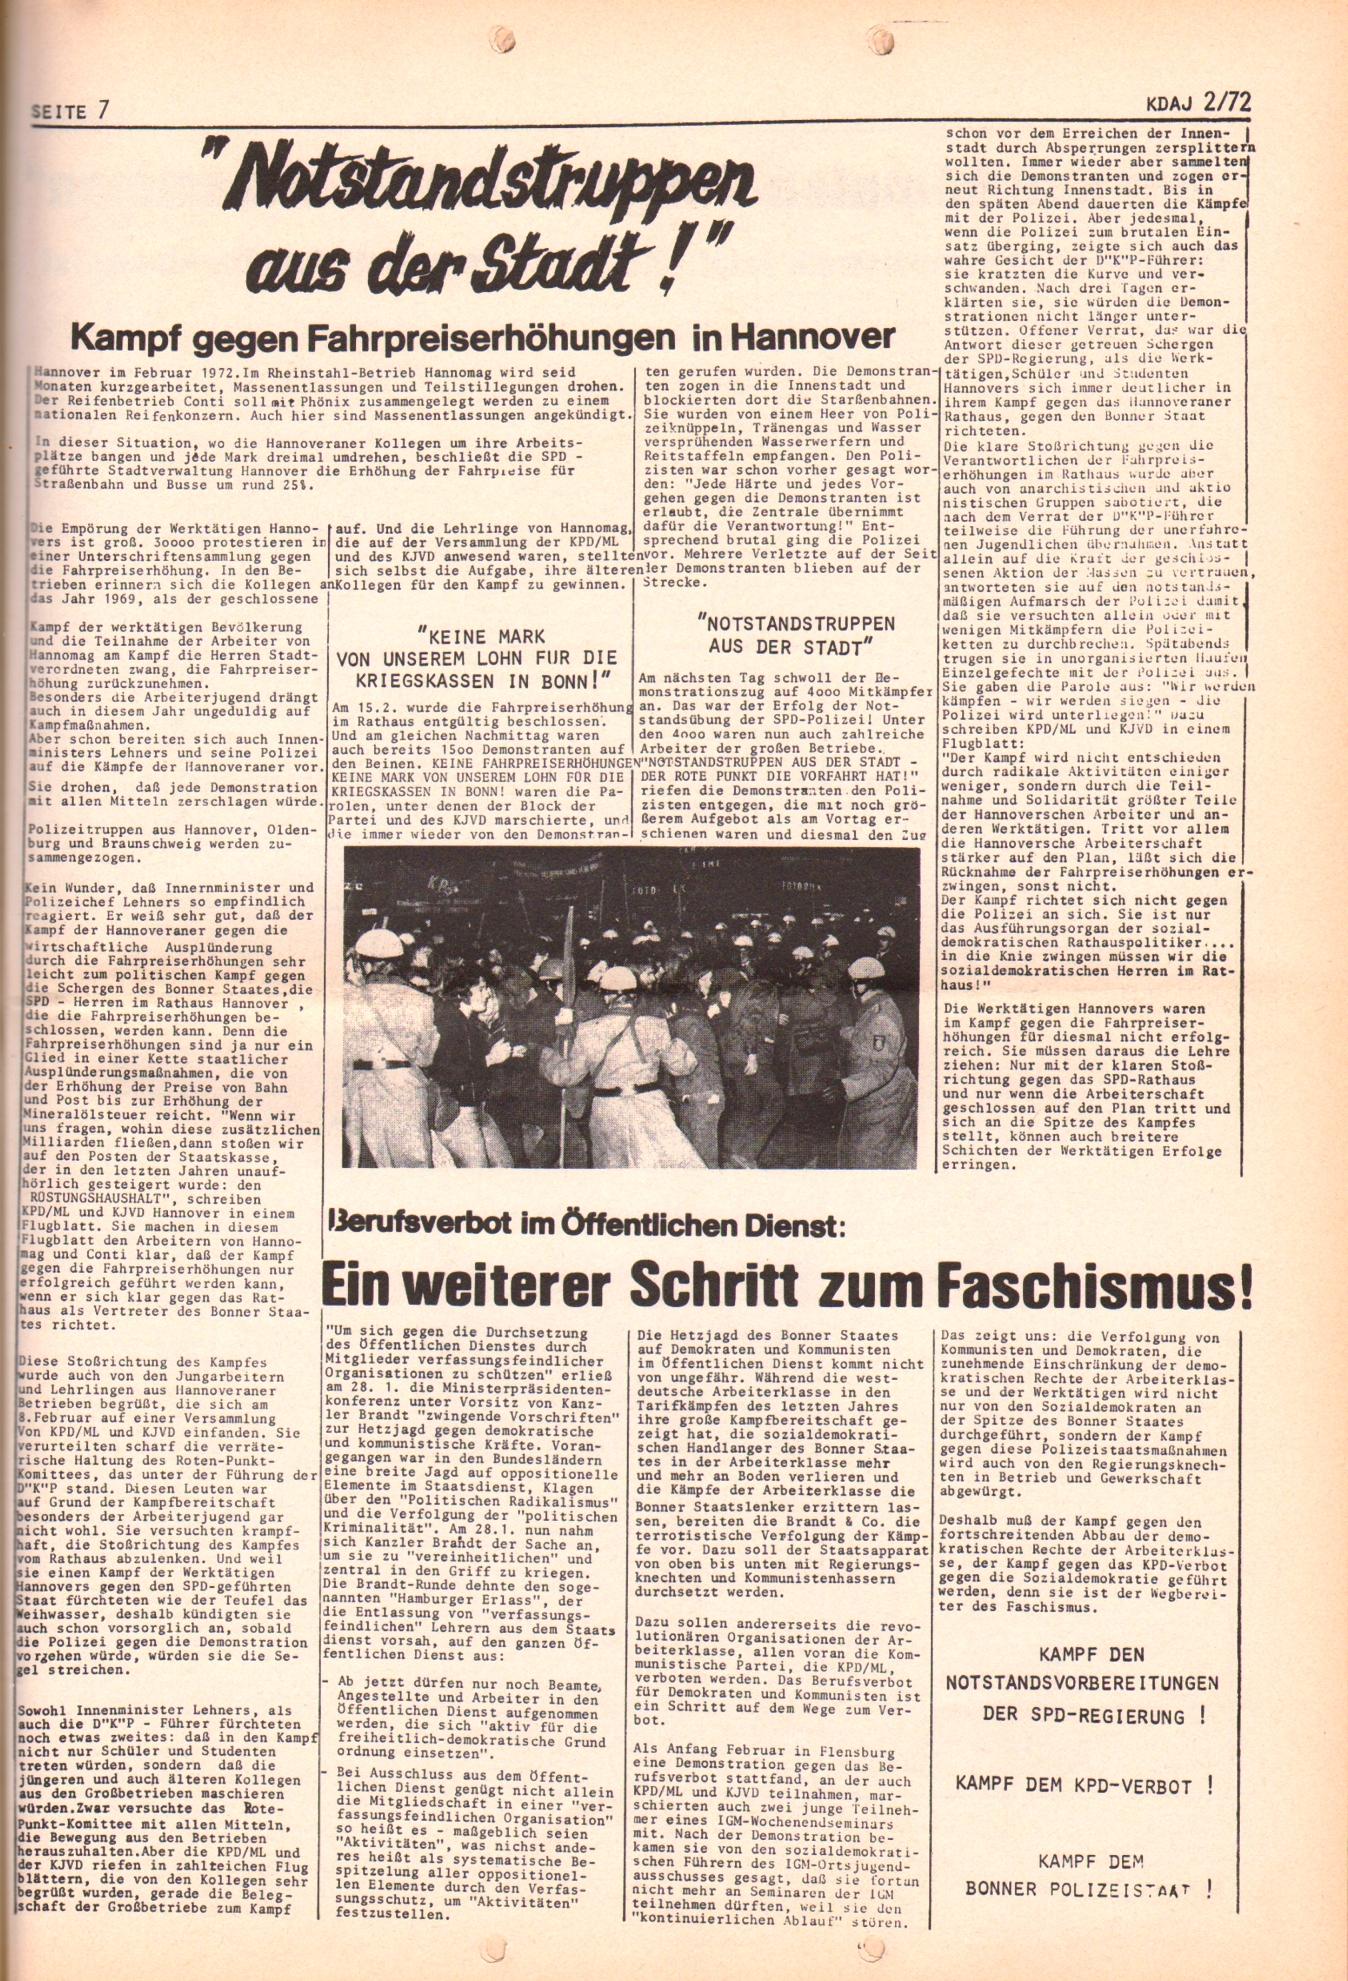 KDAJ, 3. Jg., März 1972, Nr. 2, Seite 7